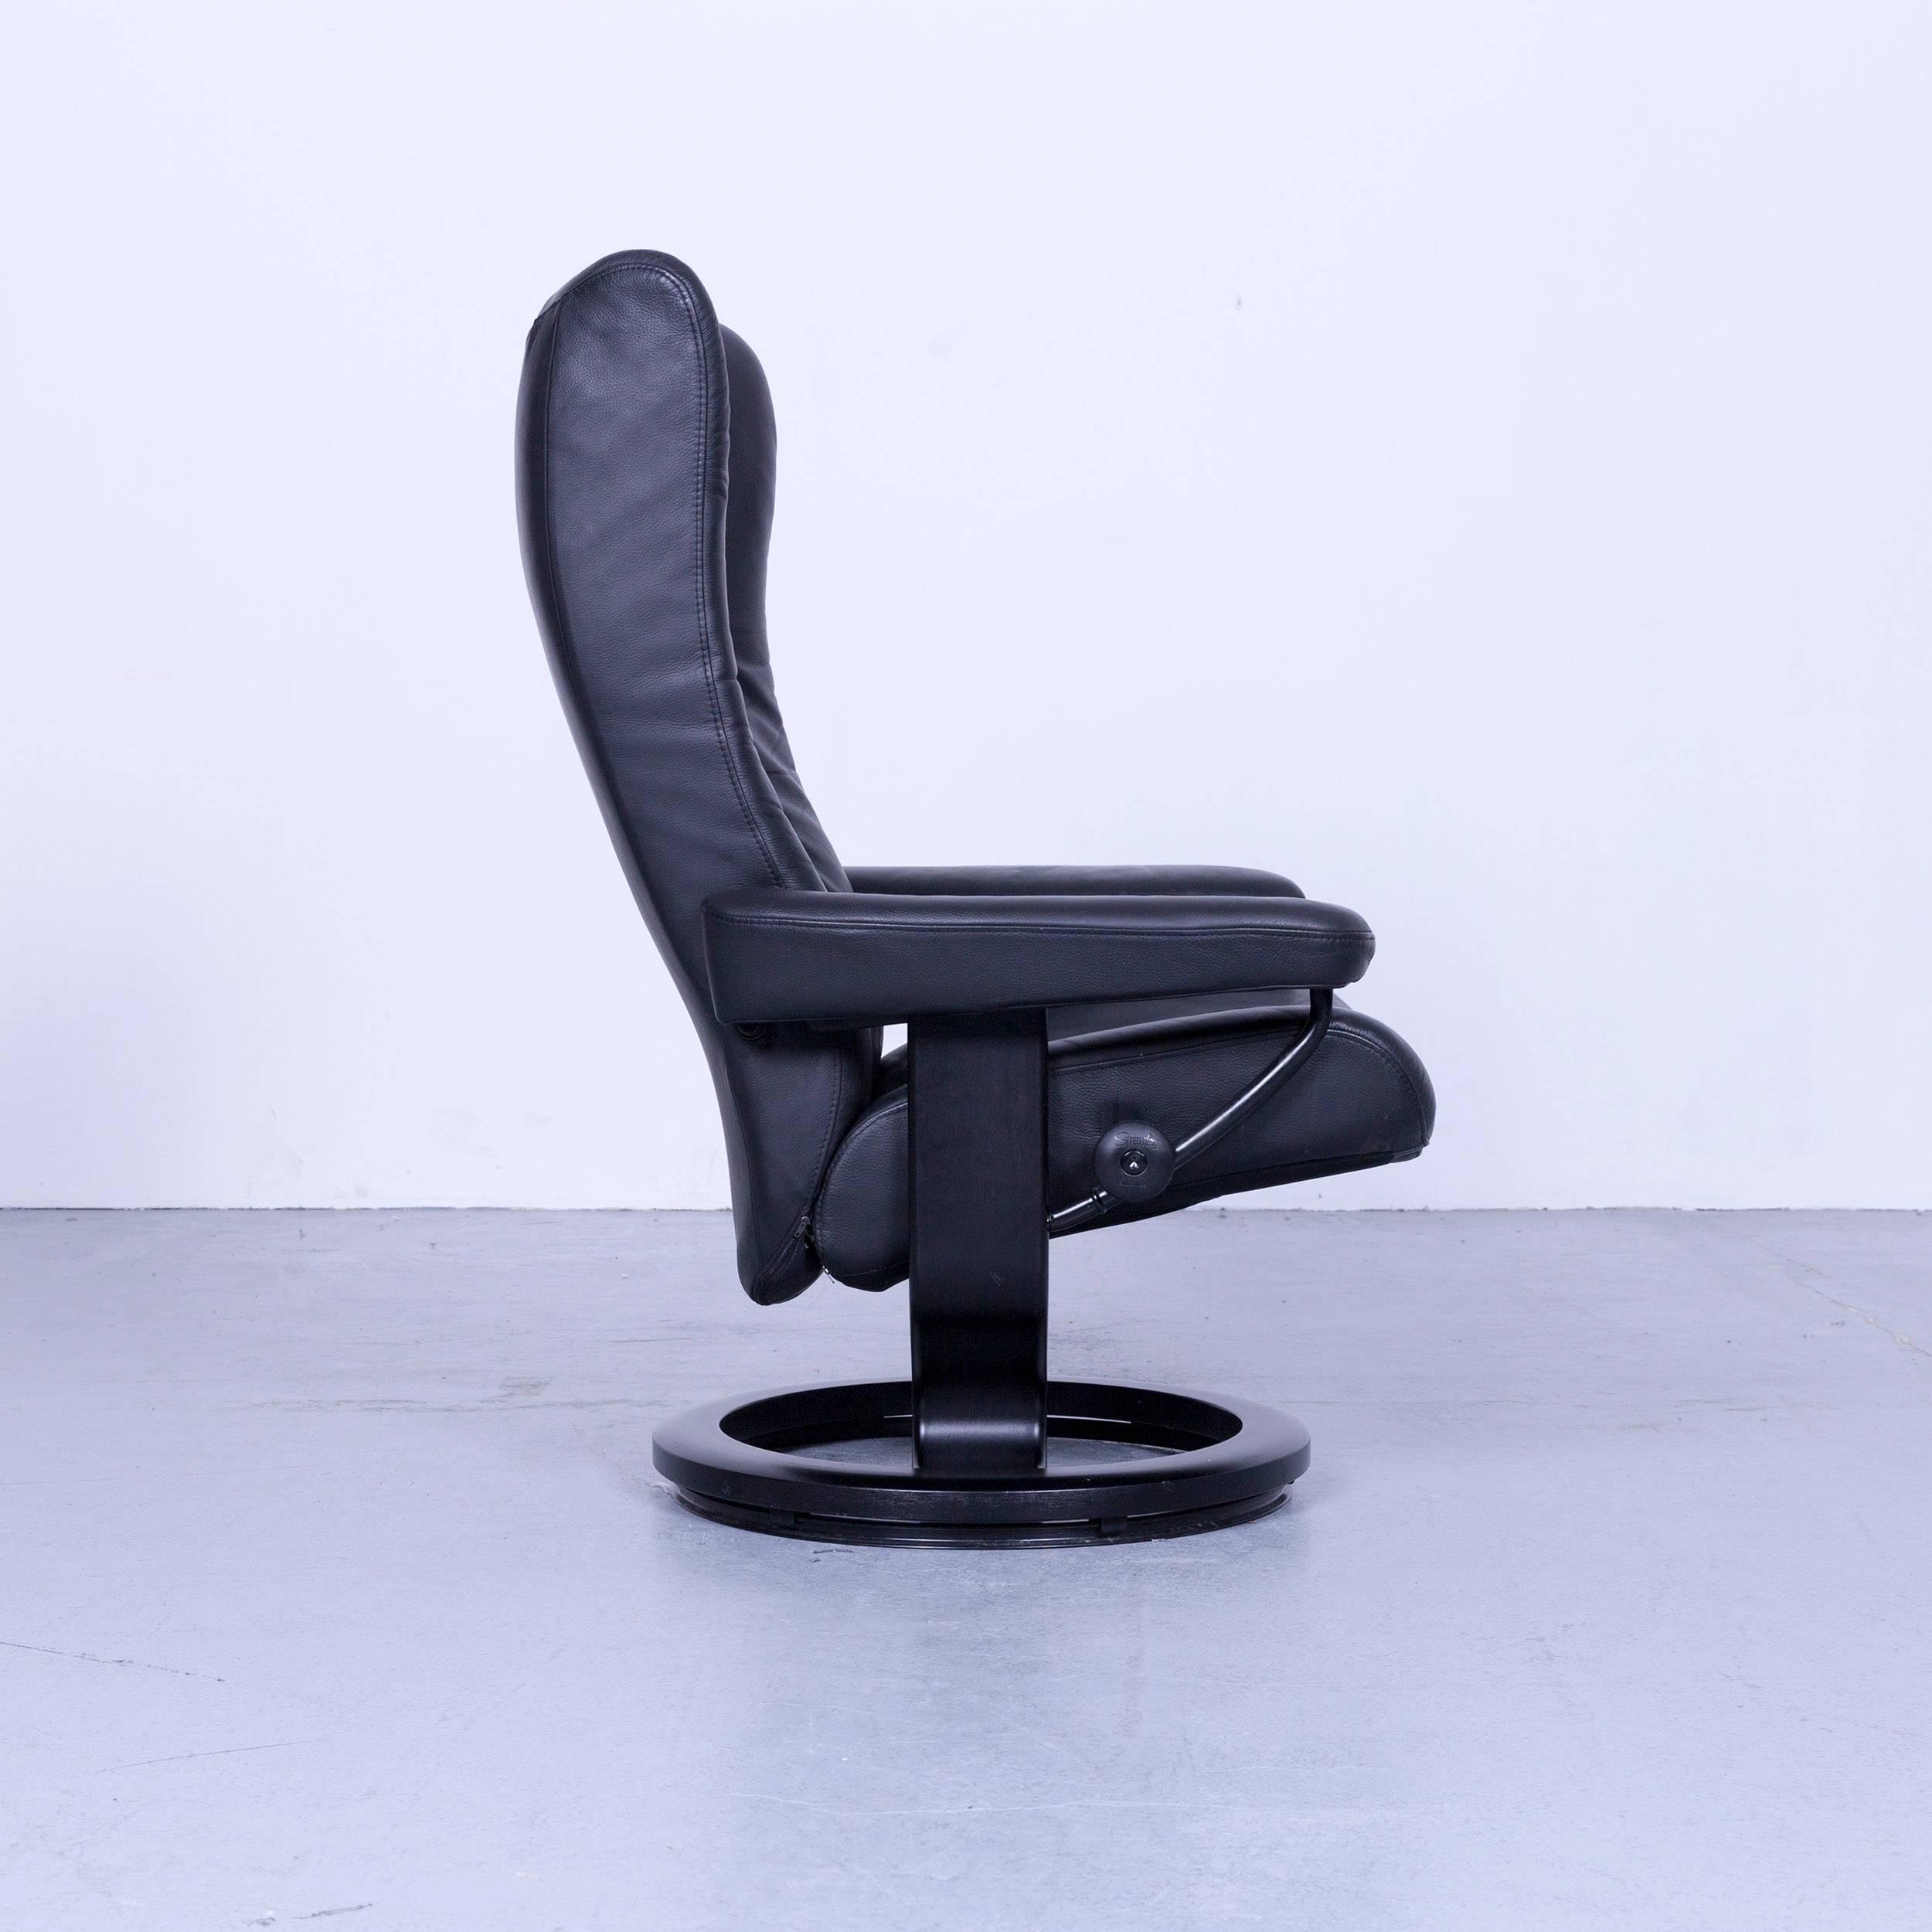 ekornes stressless wing armchair black leather modern recliner chair